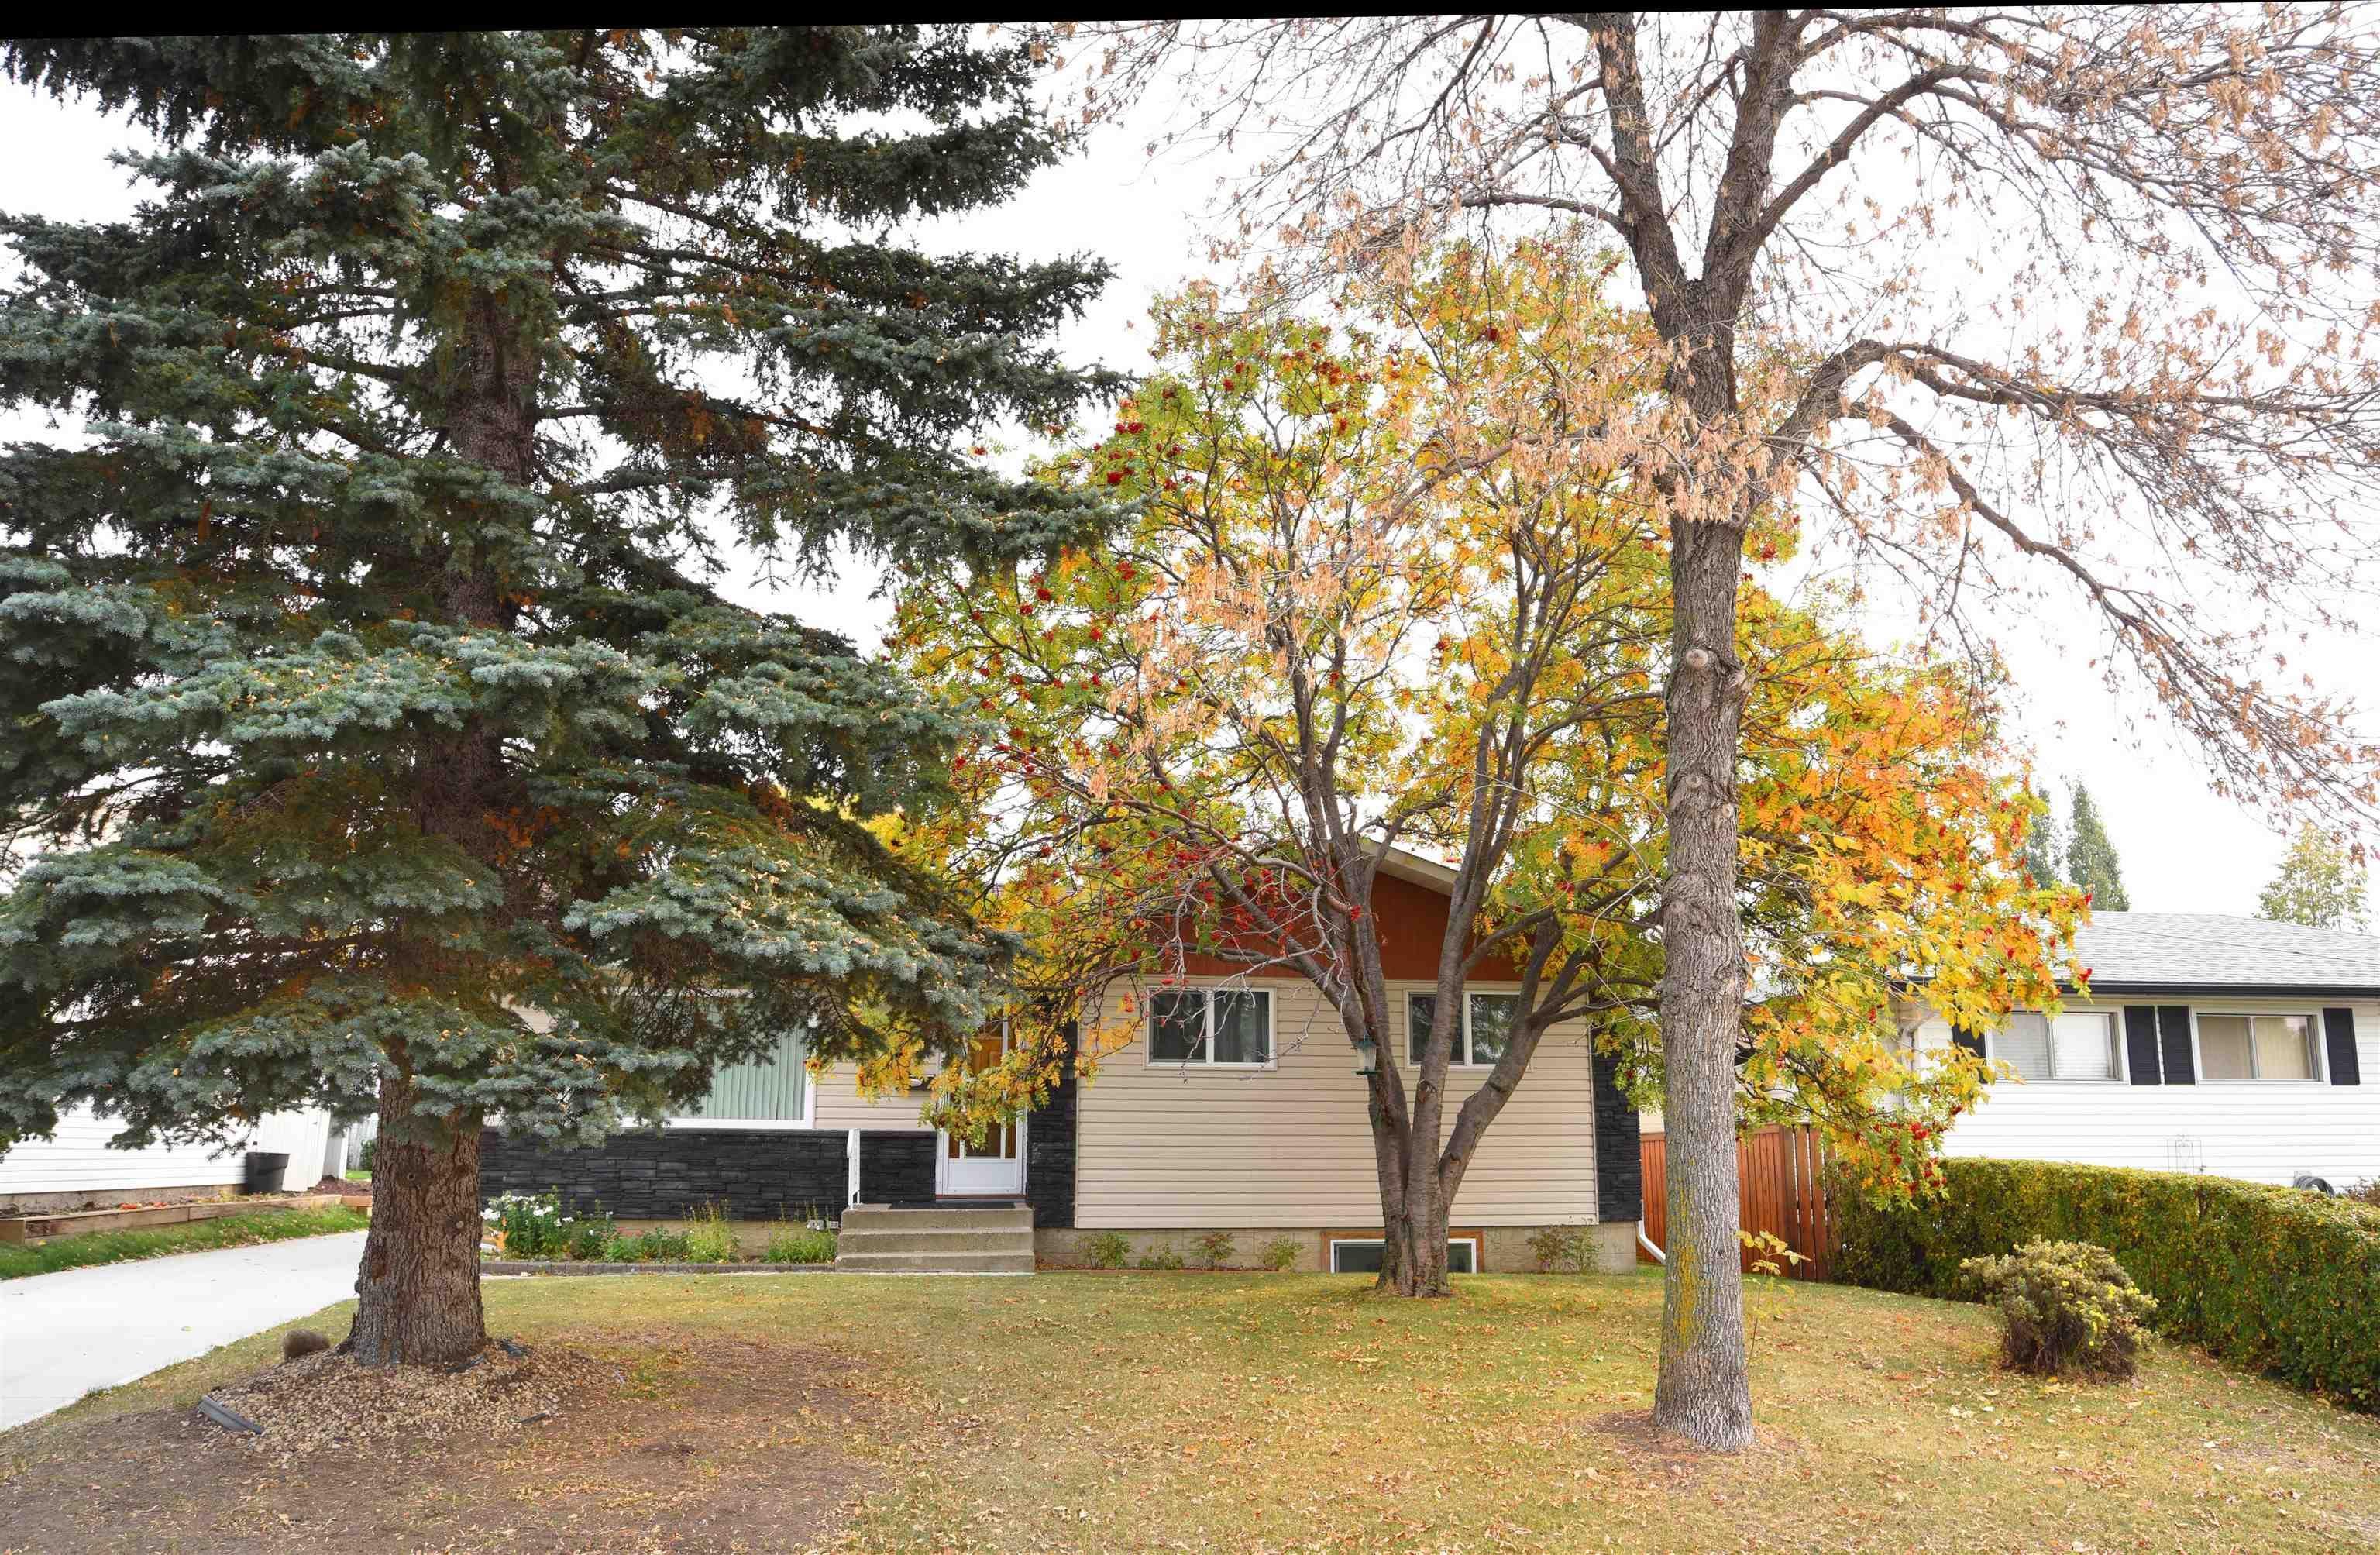 Main Photo: 9 GALAXY Way: Sherwood Park House for sale : MLS®# E4265719